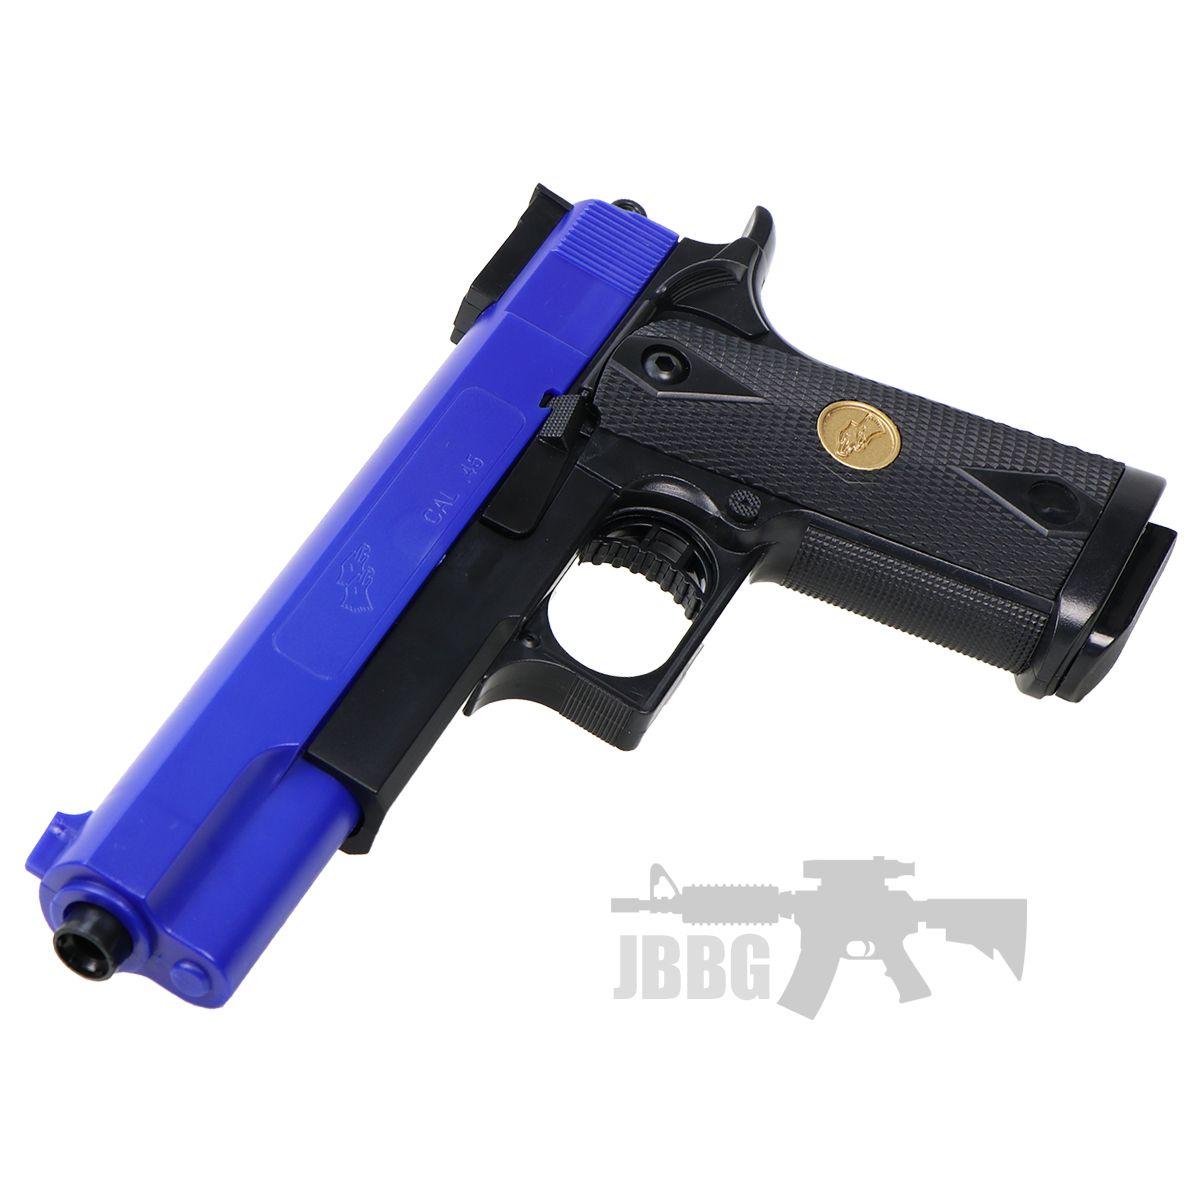 pistol bb gun 1